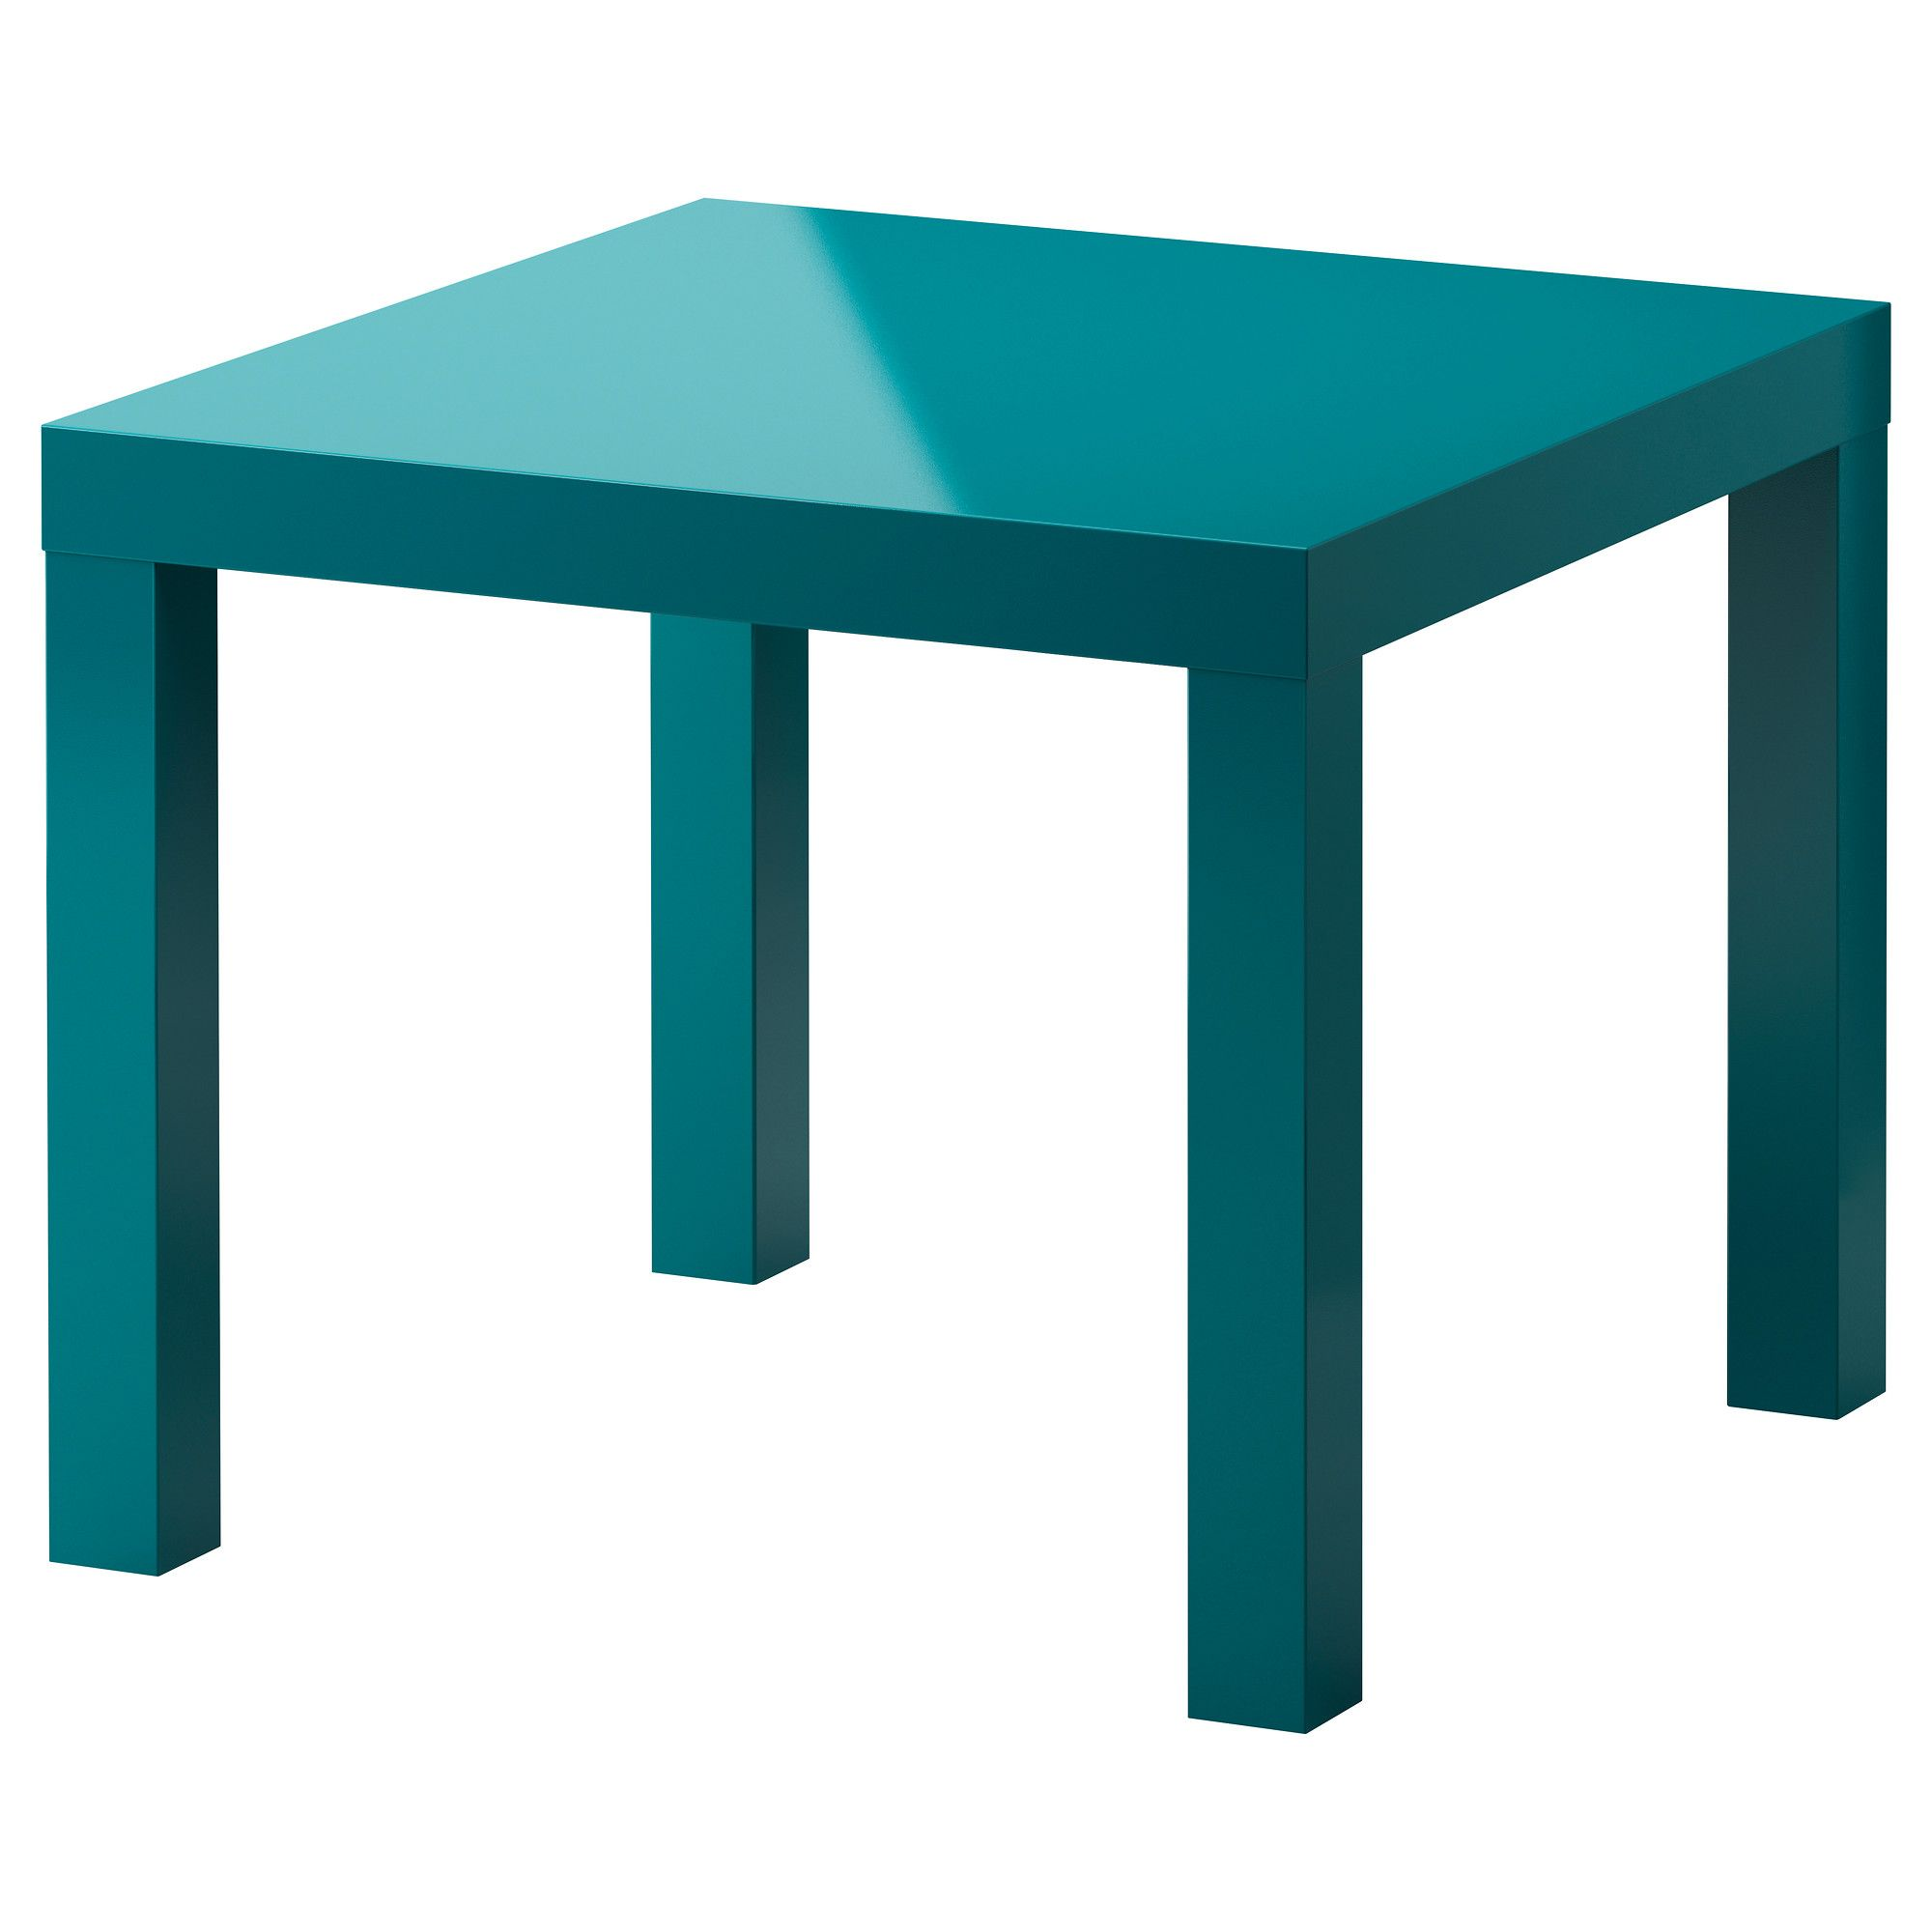 B Organised Wandplank.Ikea Lack Wandregal Montage Wandregal Hochglanz Perfect Hochglanz